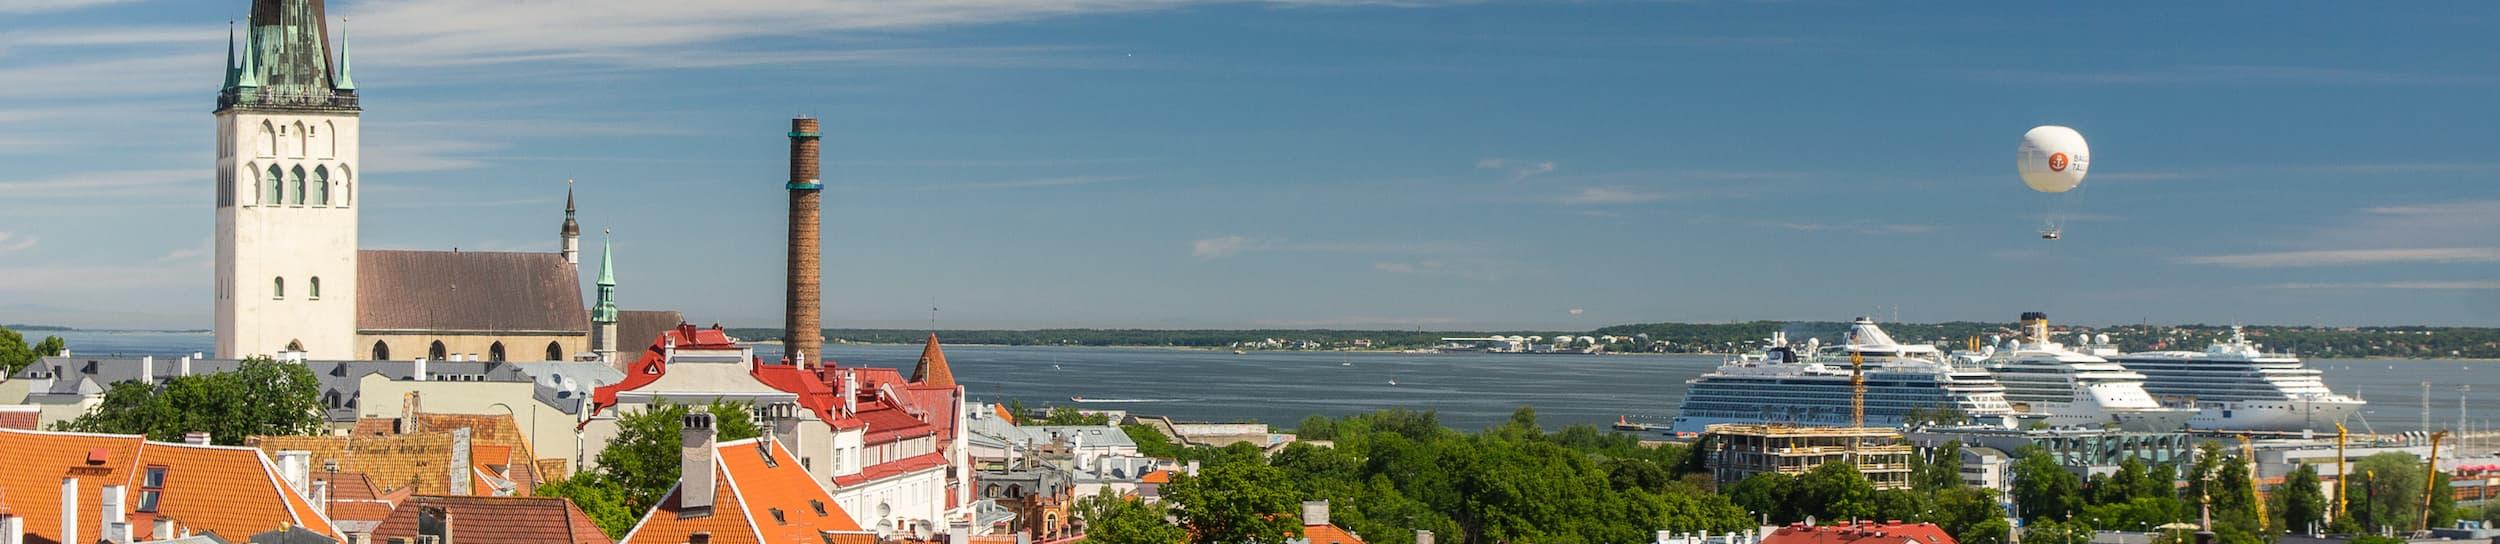 Pictured: skyline of Tallinn